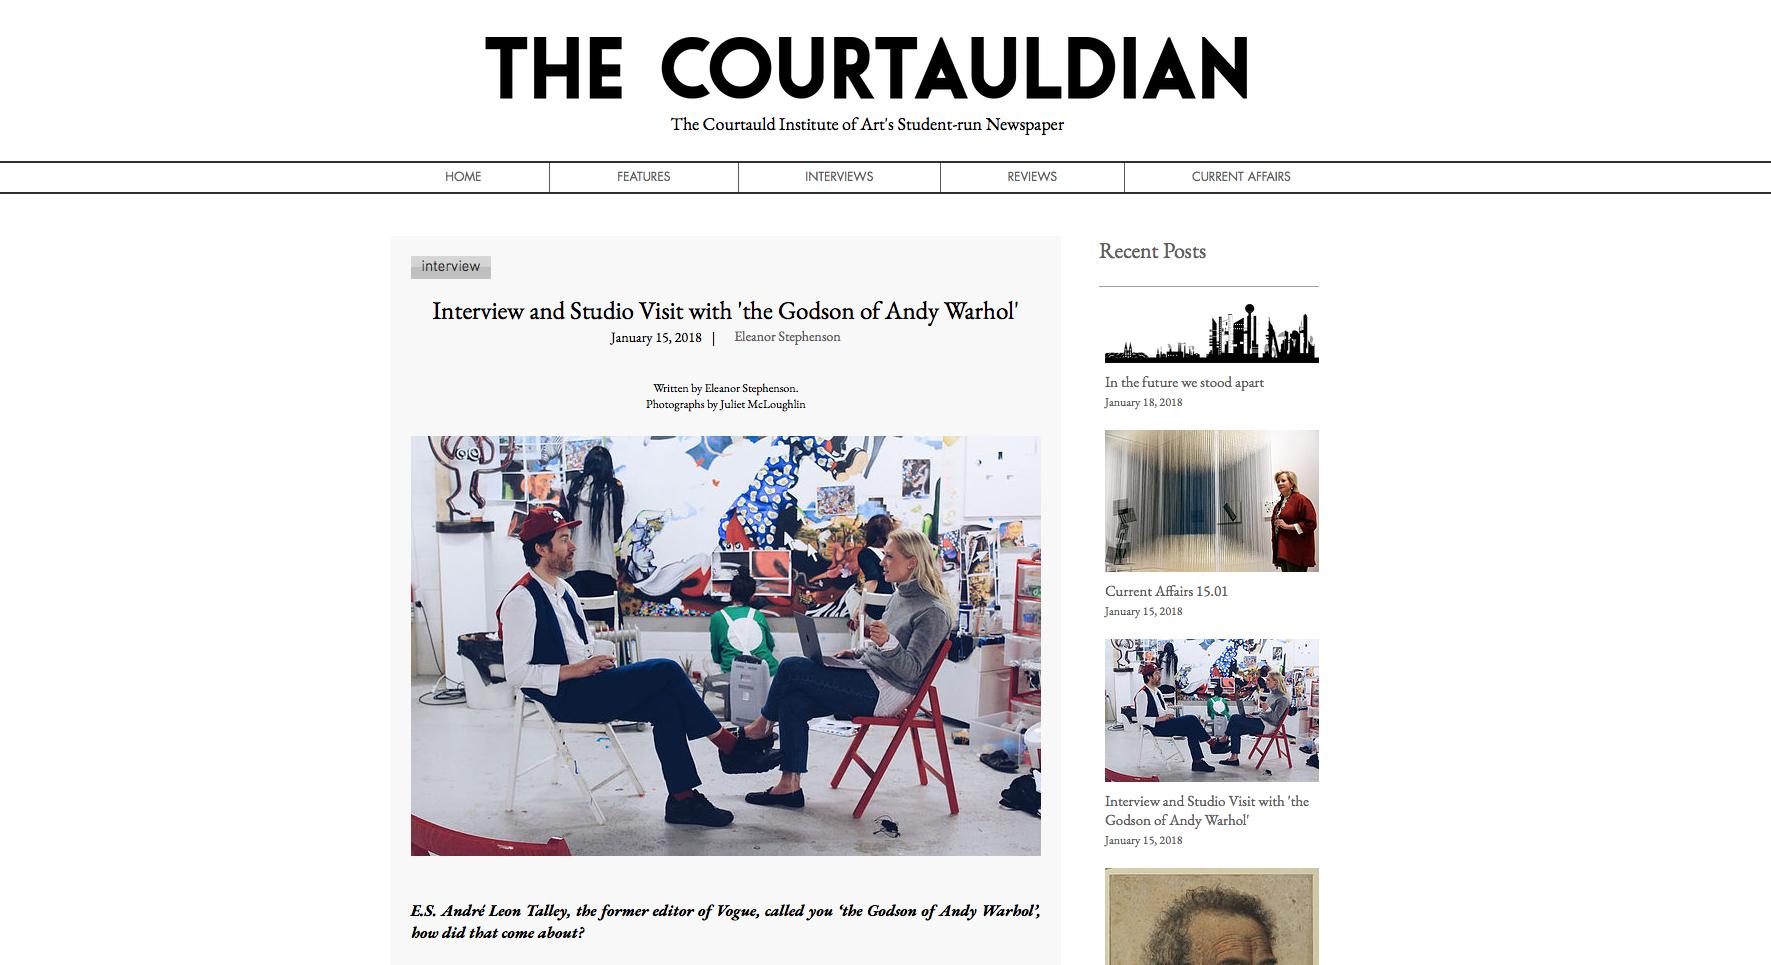 PHILIP COLBERT | THE COURTAULDIAN | JANUARY 2018